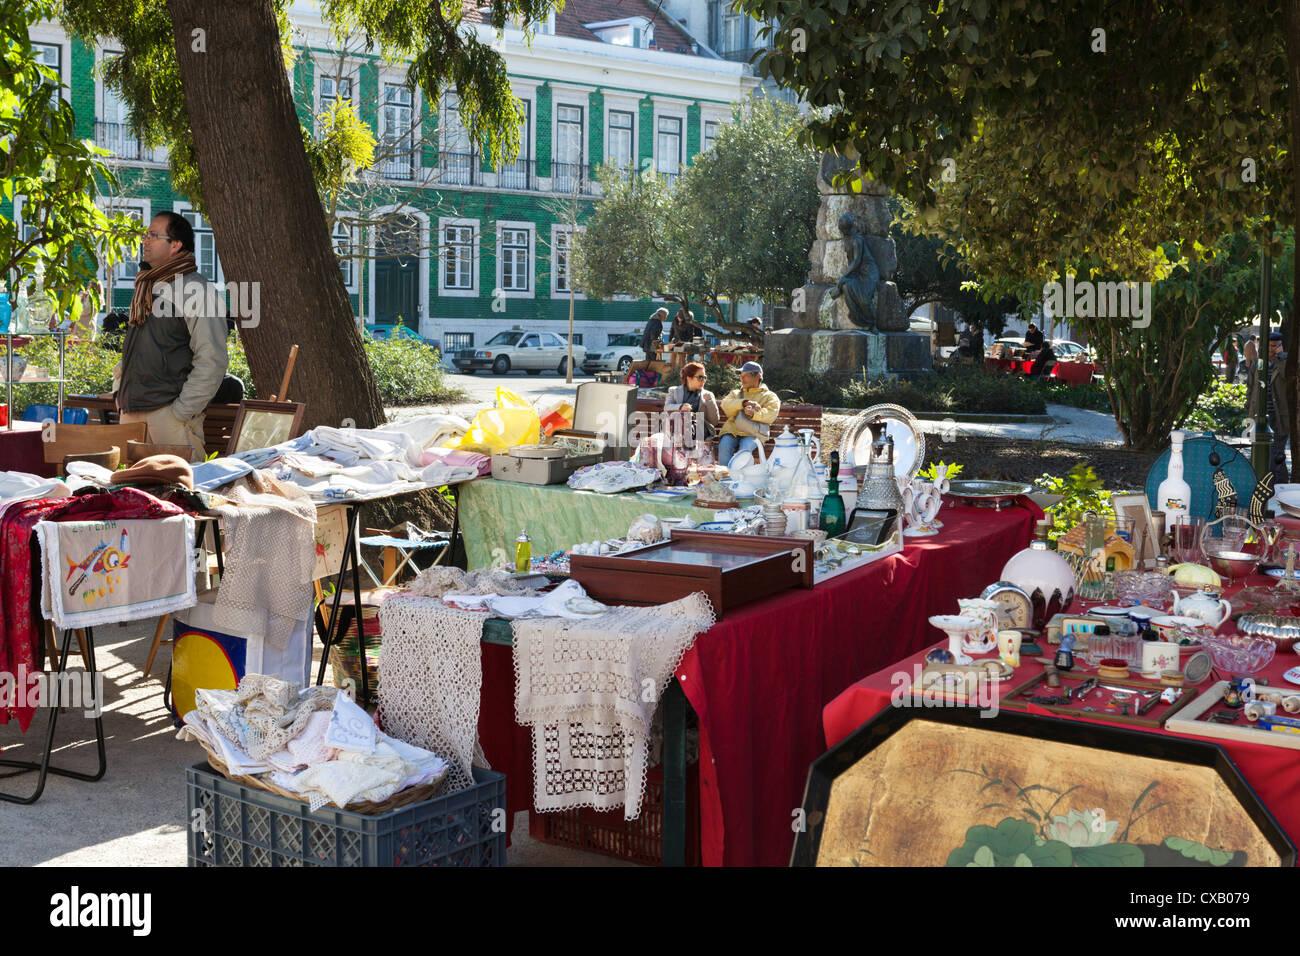 Street market on Praca do Principe Real, Bairro Alto, Lisbon, Portugal, Europe - Stock Image